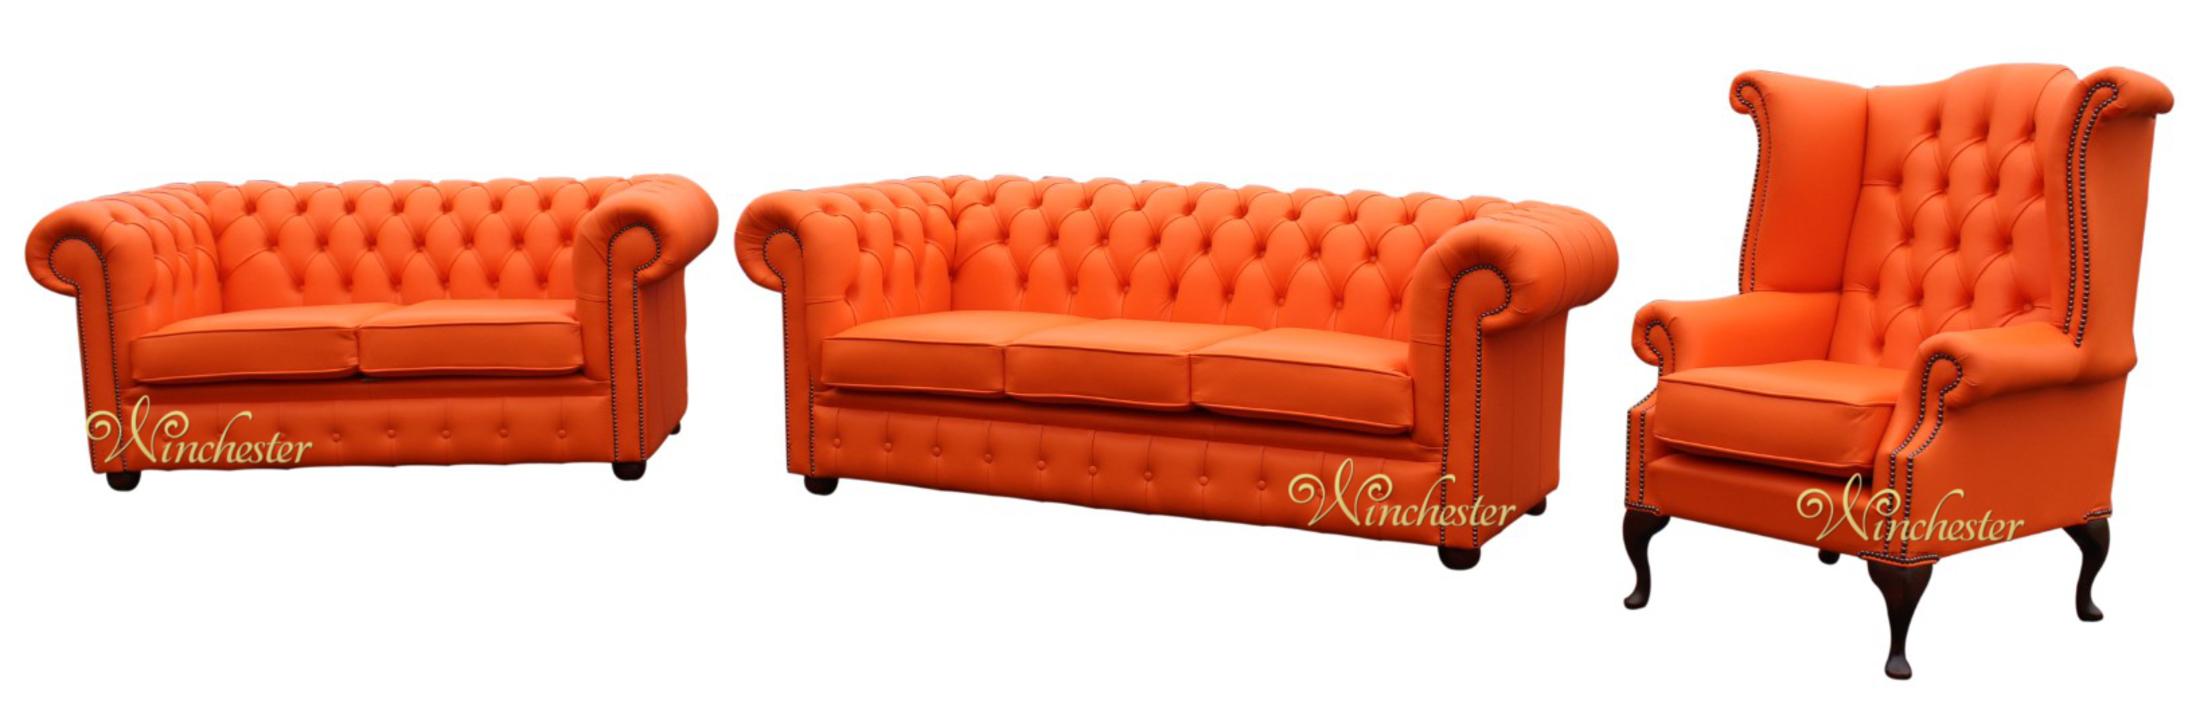 Chesterfield 3 2 1 Suite Mandarin Orange Leather Wc